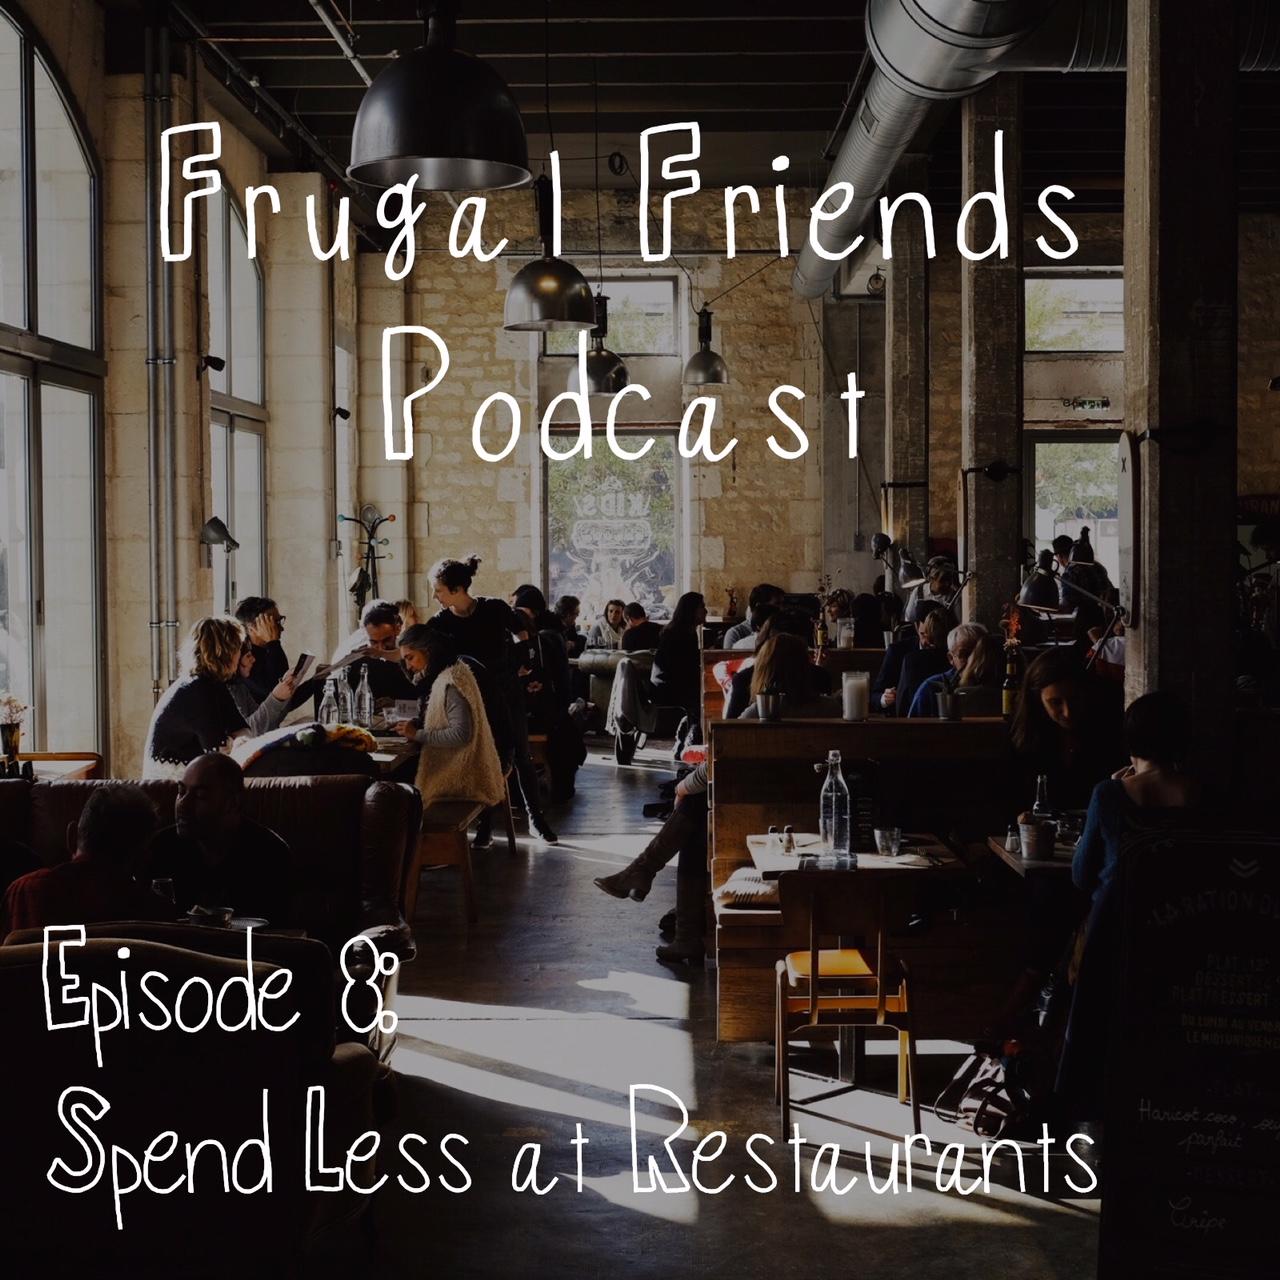 Episode 8: Spend Less at Restaurants